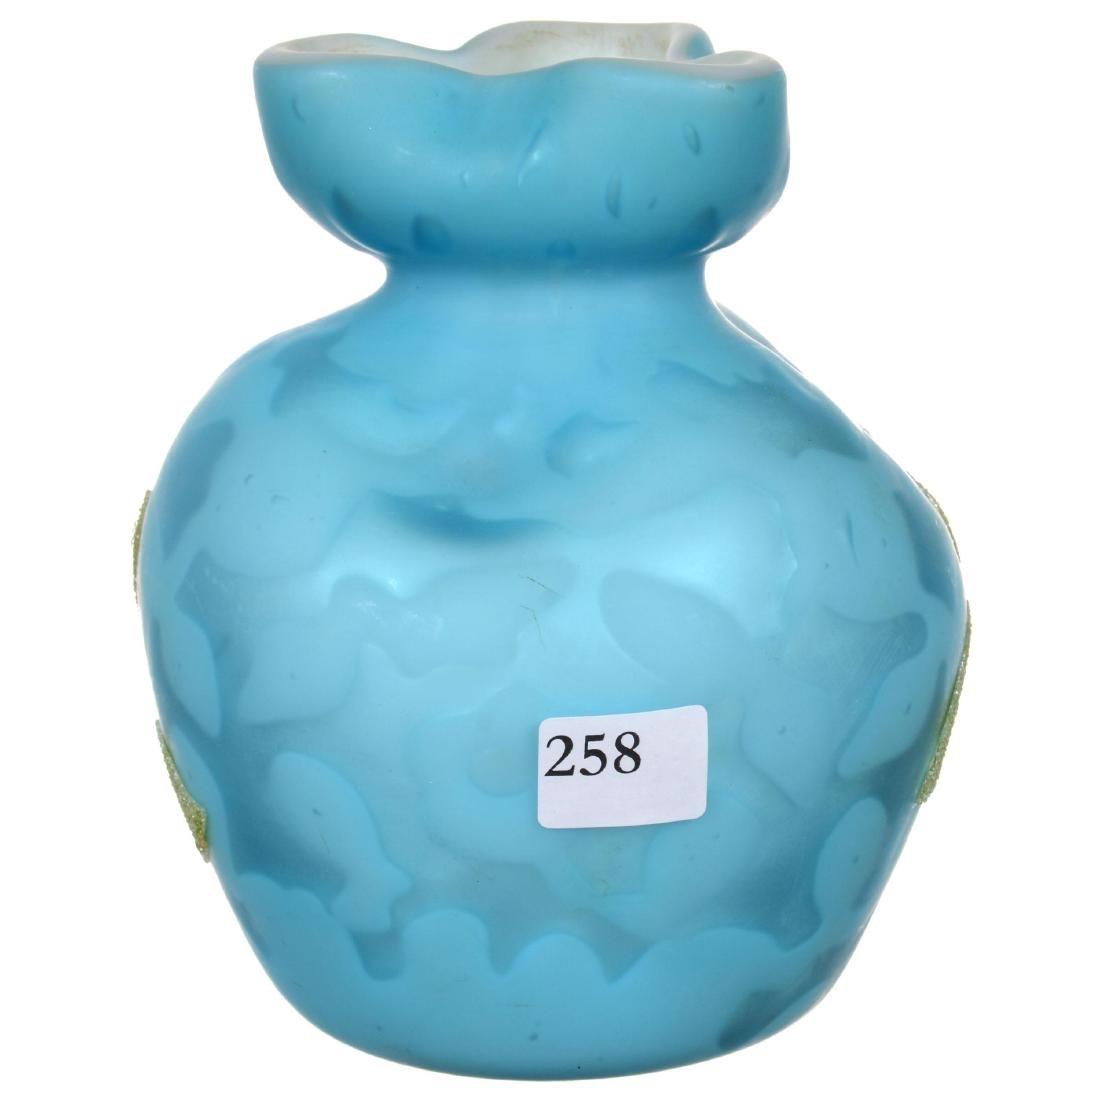 Blue Satin Mother of Pearl Art Glass Vase - 2